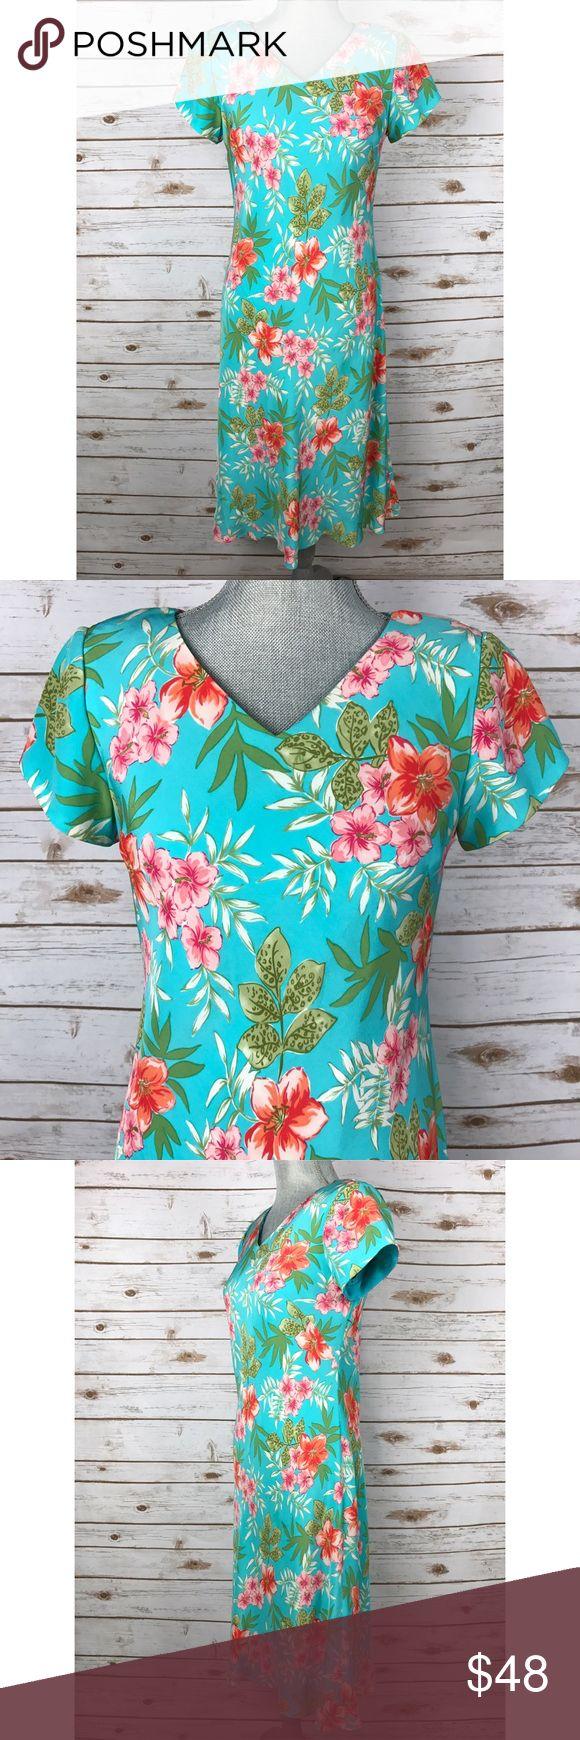 {Talbots} Tropical Print Silk Dress Condition: Excellent-like new!! Talbots Dresses Midi